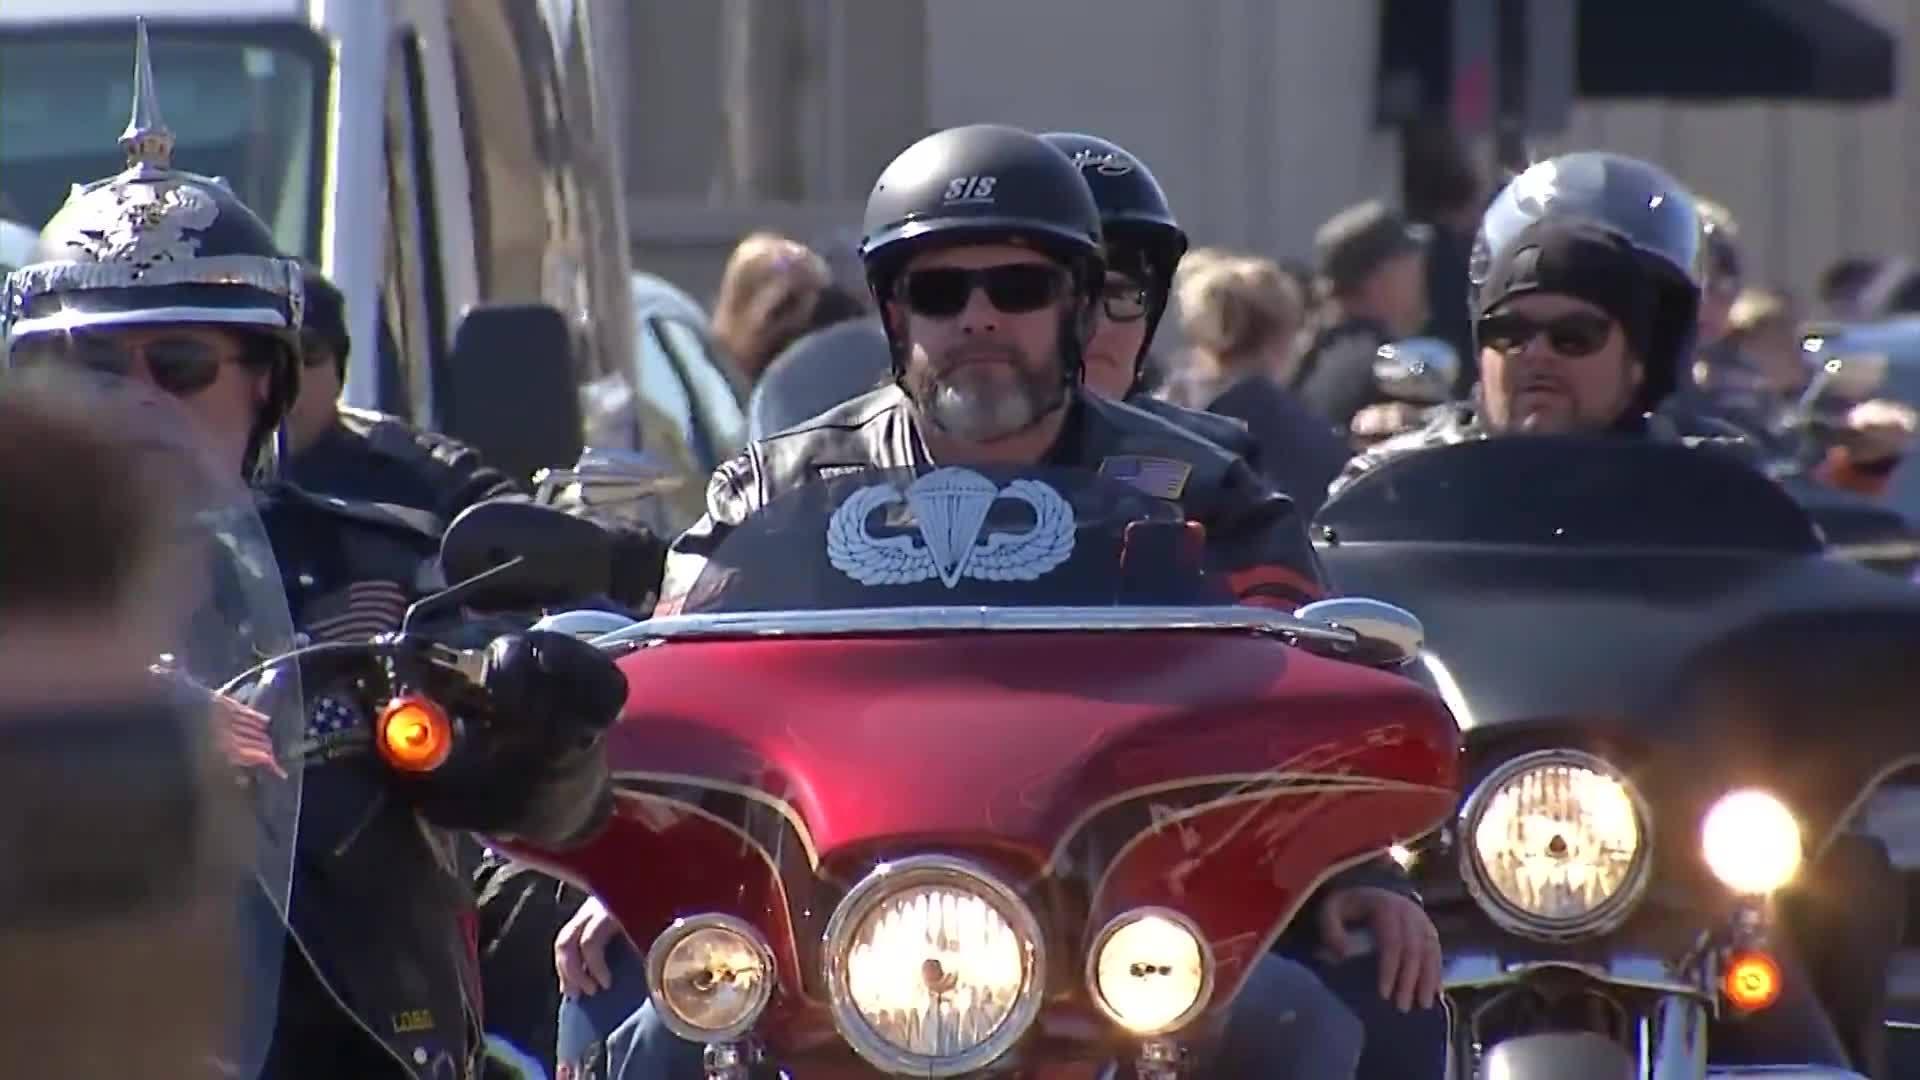 Patriot Guard leads procession for fallen hero